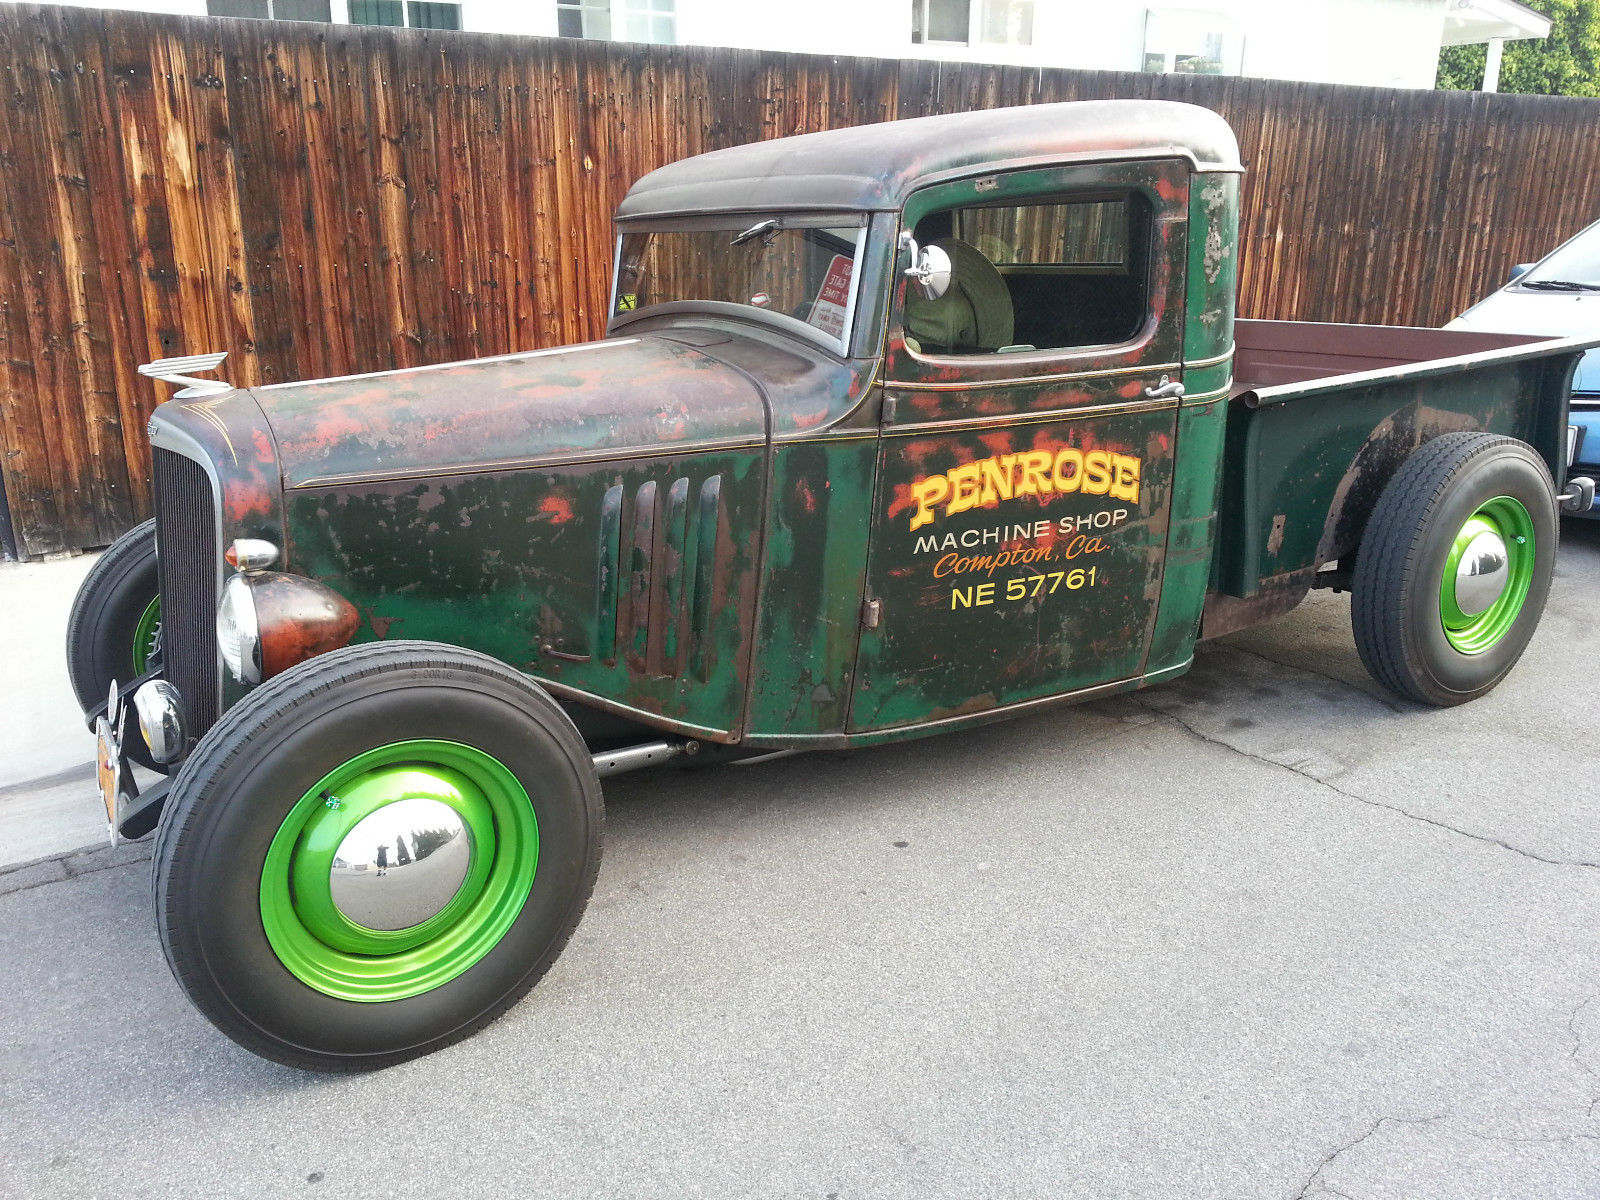 1934 Chevrolet Truck Retro Rod Rat 355 Sbc Engine Fresh Street Wiring Harness For Ls1 Other Pickups Depot Hack